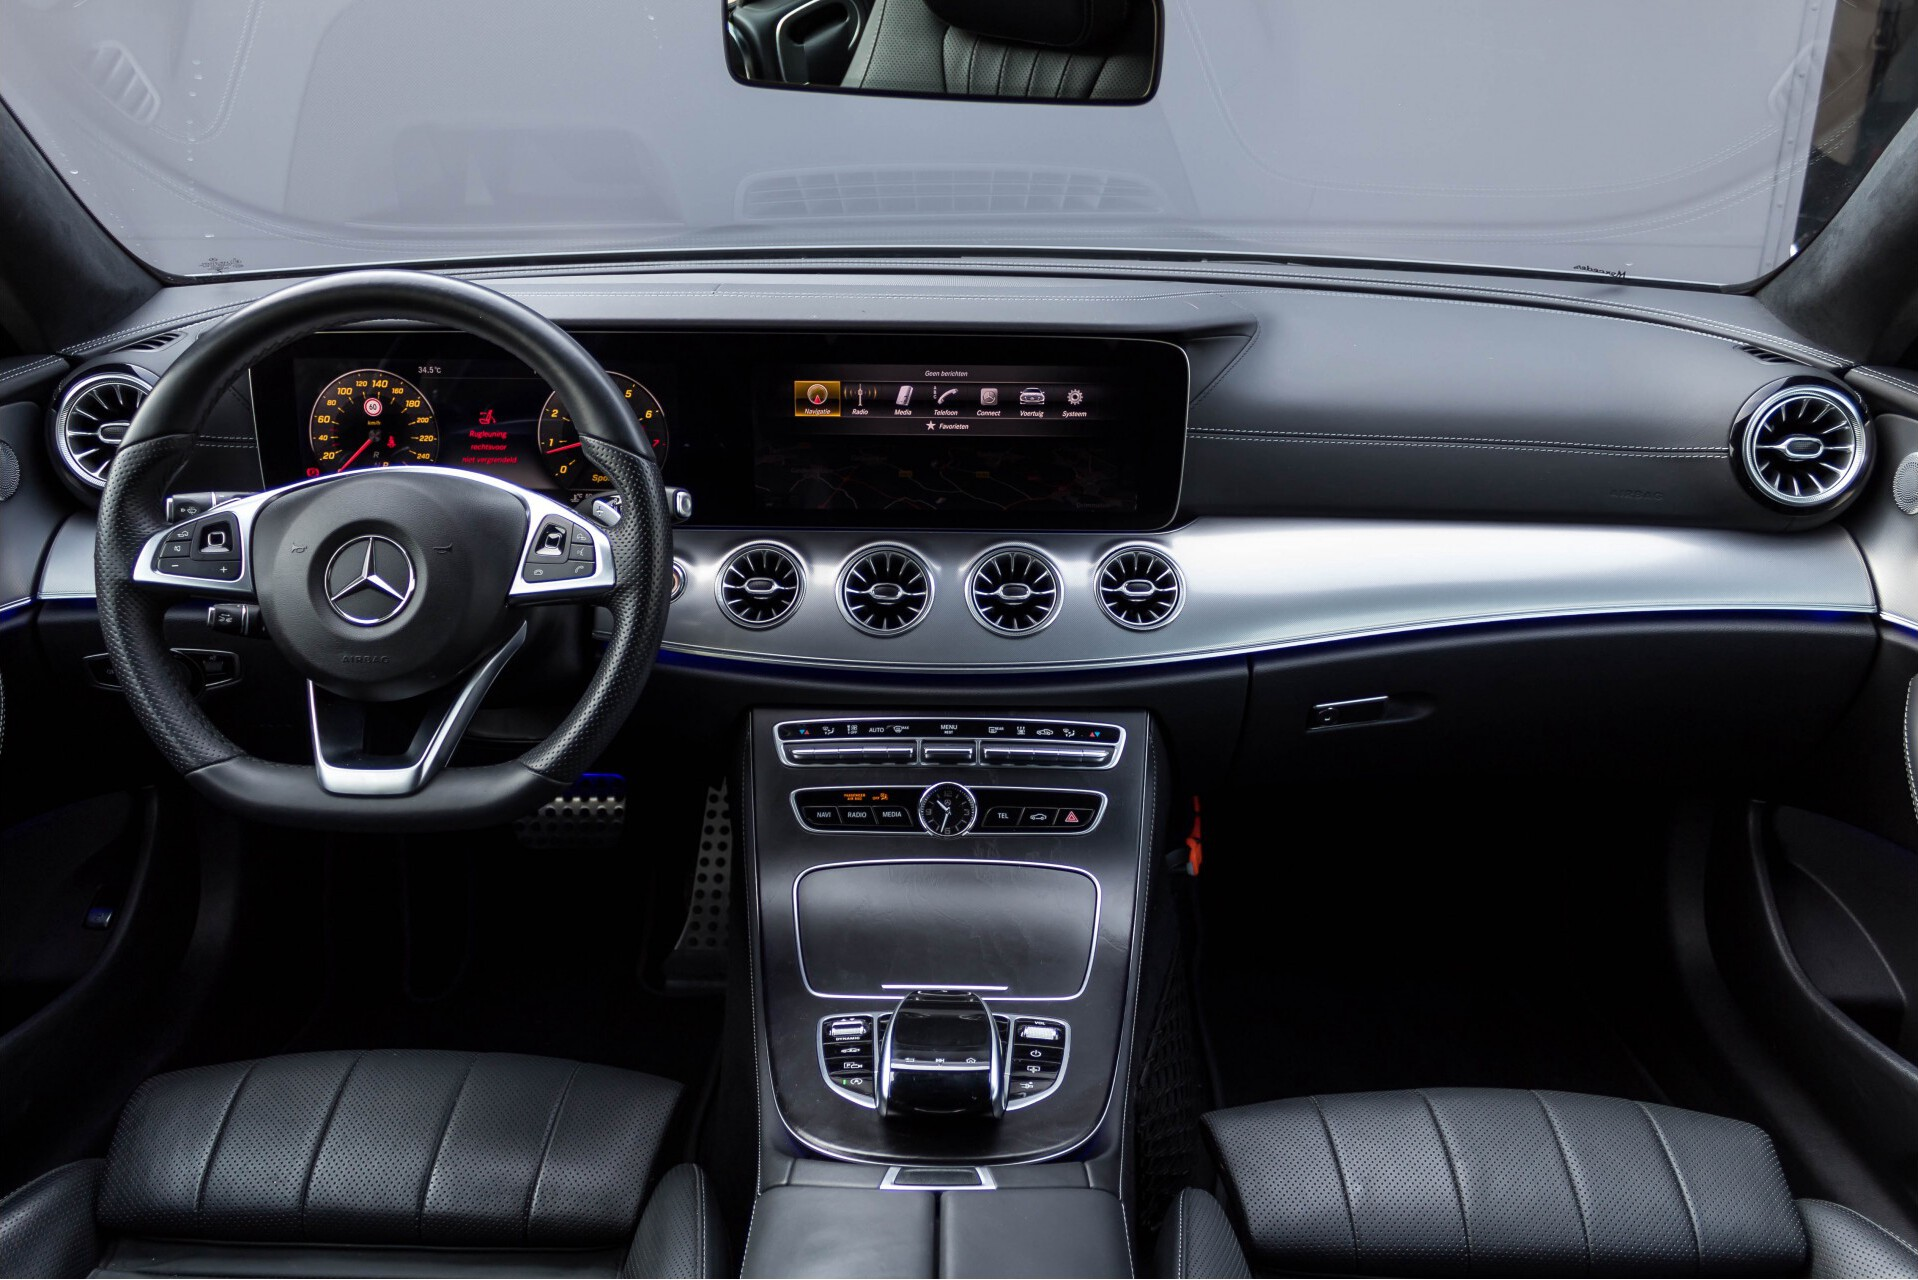 Mercedes-Benz E-Klasse Coupé 300 AMG Luchtvering/Distronic/Keyless/Designo/Burmester/Stoelkoeling Aut7 Foto 6